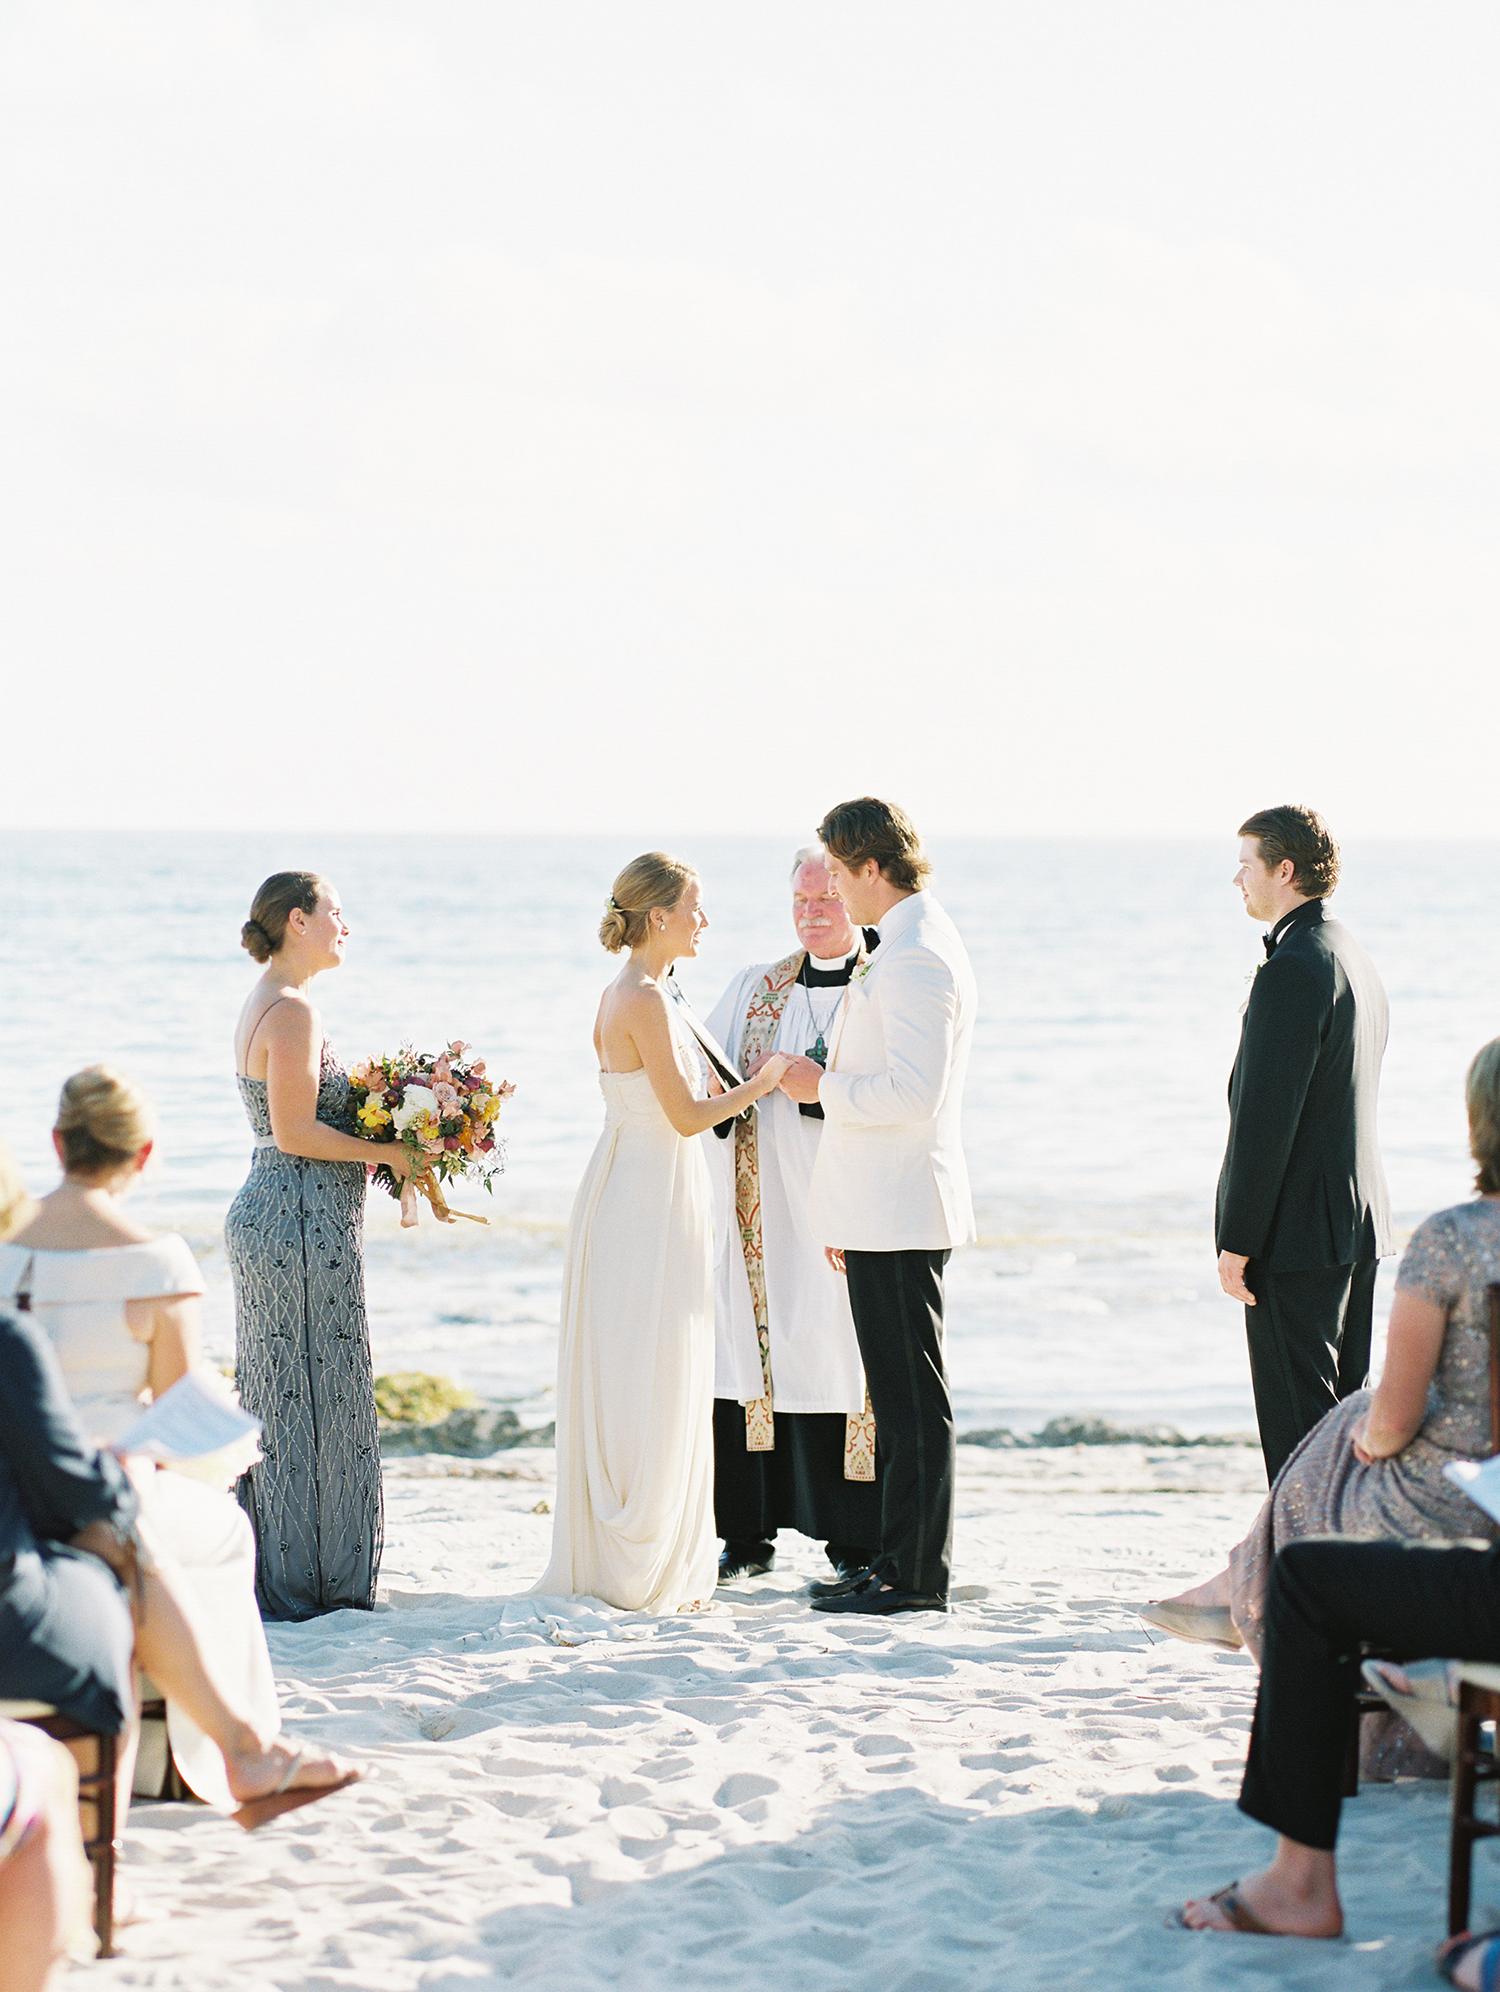 beth john wedding ceremony on the beach